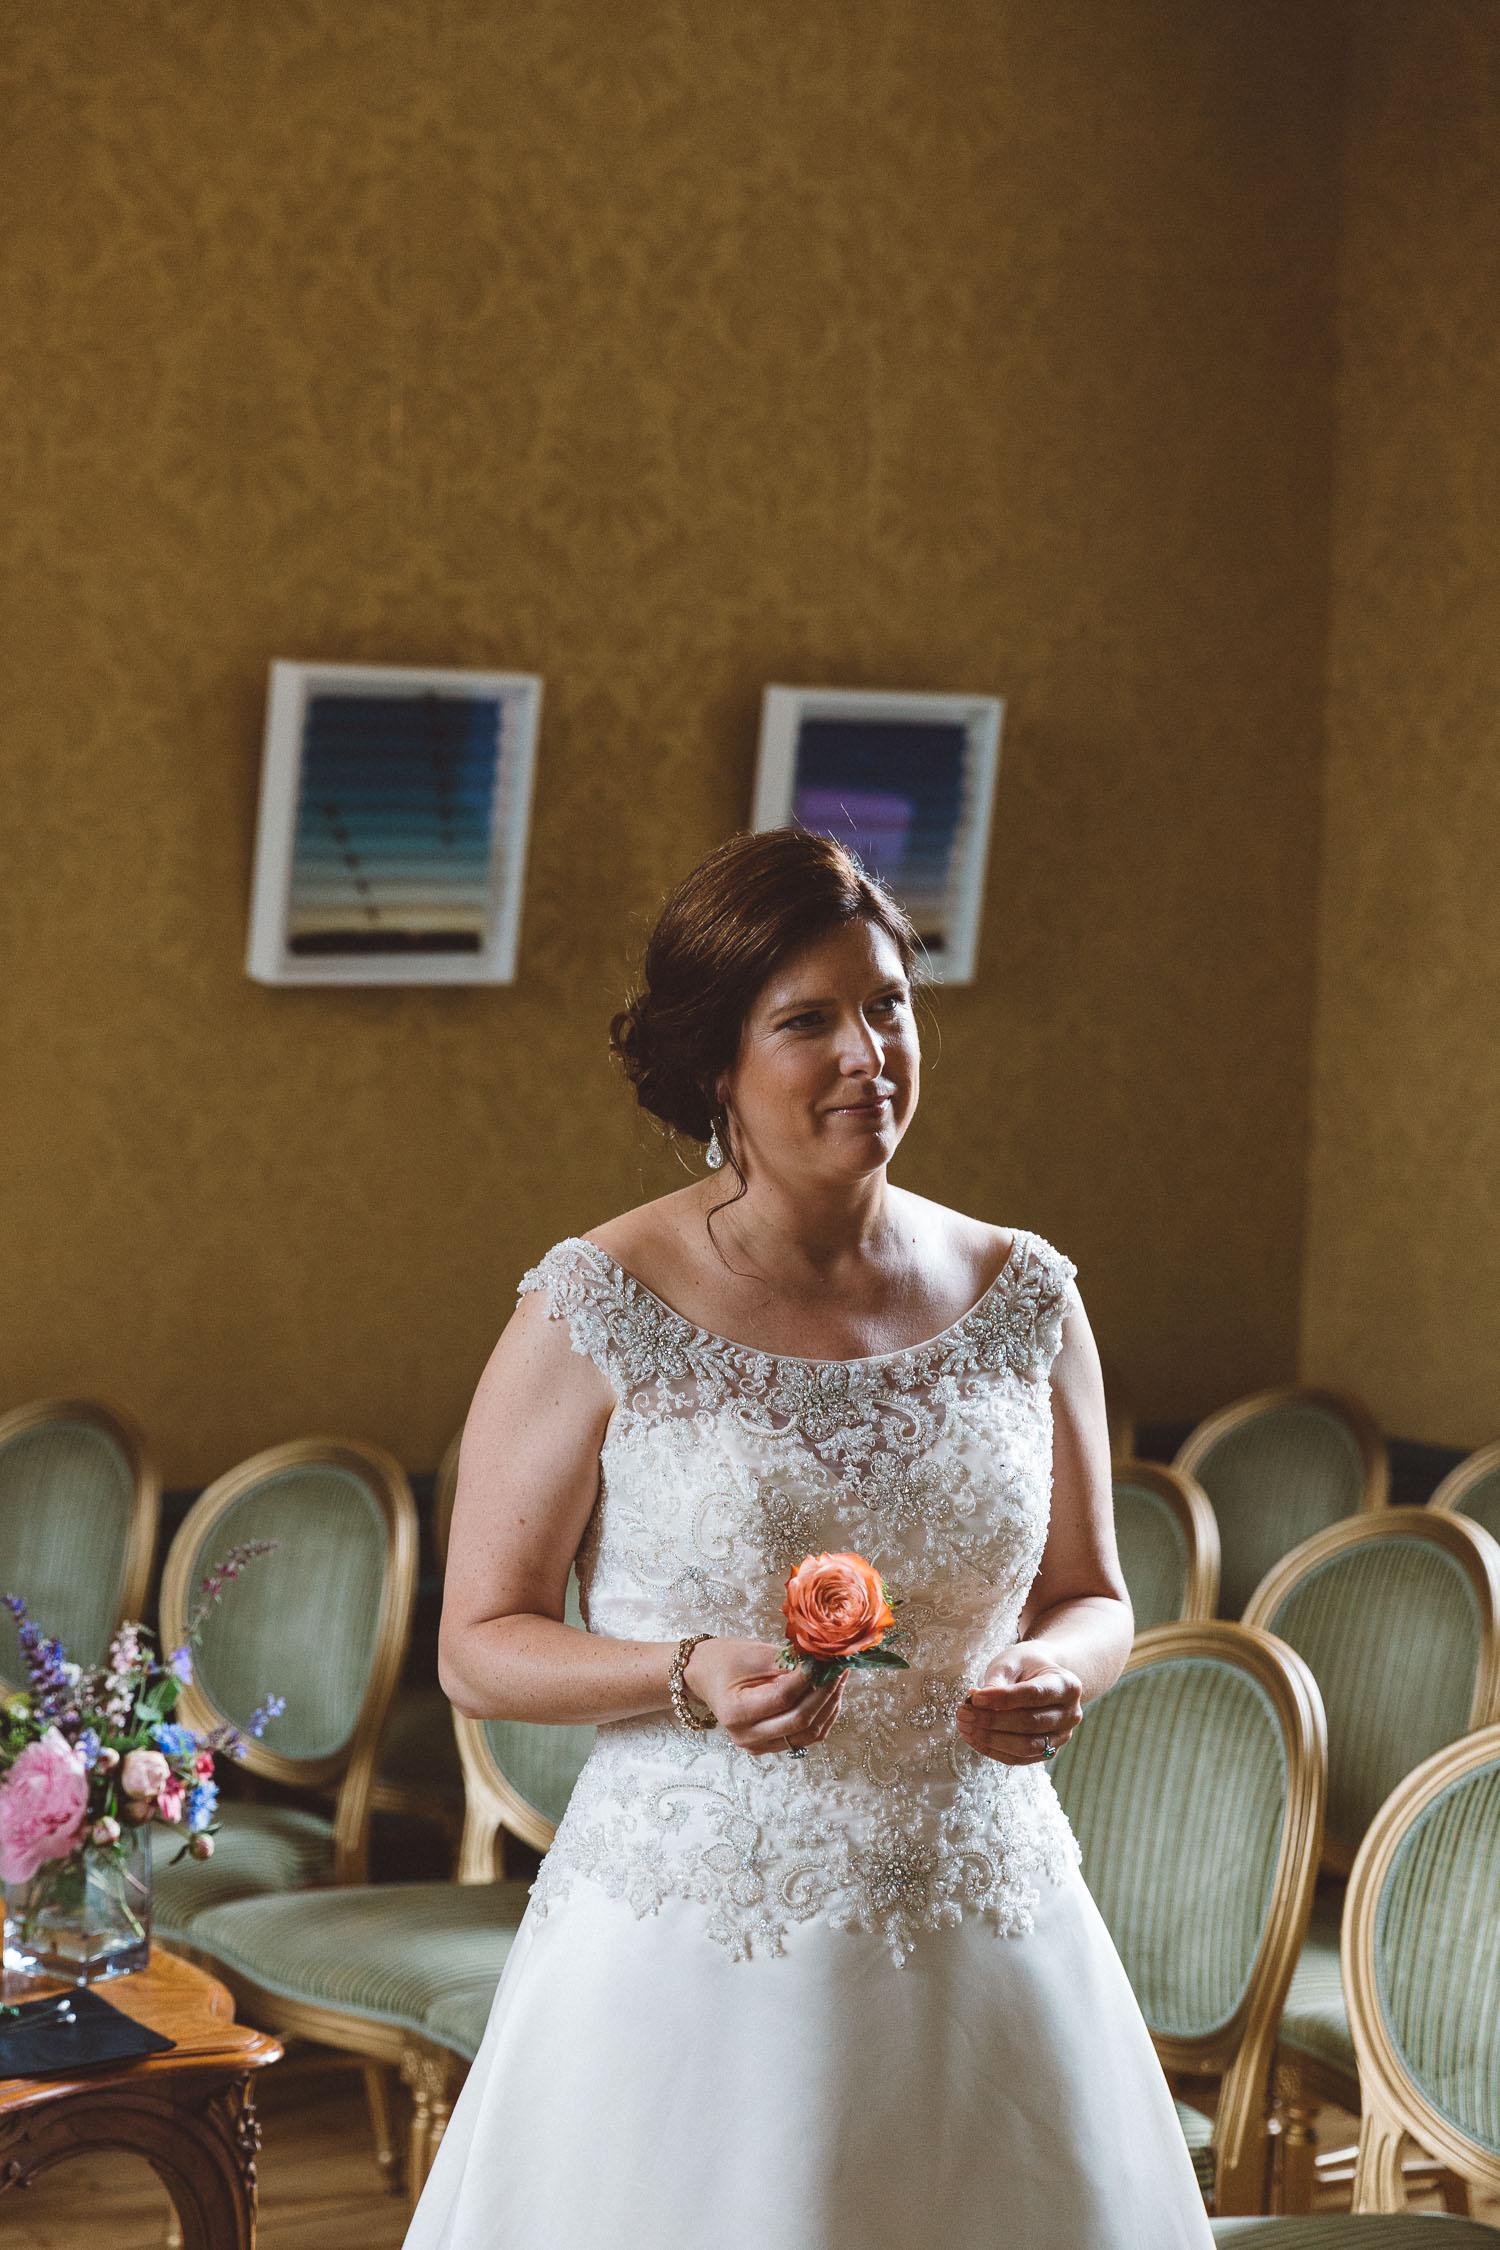 Wedding-huwelijk-trouwen-bruiloft-photography-fotografie-fotograaf-photographer-Huize-Frankendael-On-a-hazy-morning-Amsterdam-The-Netherlands-14.jpg